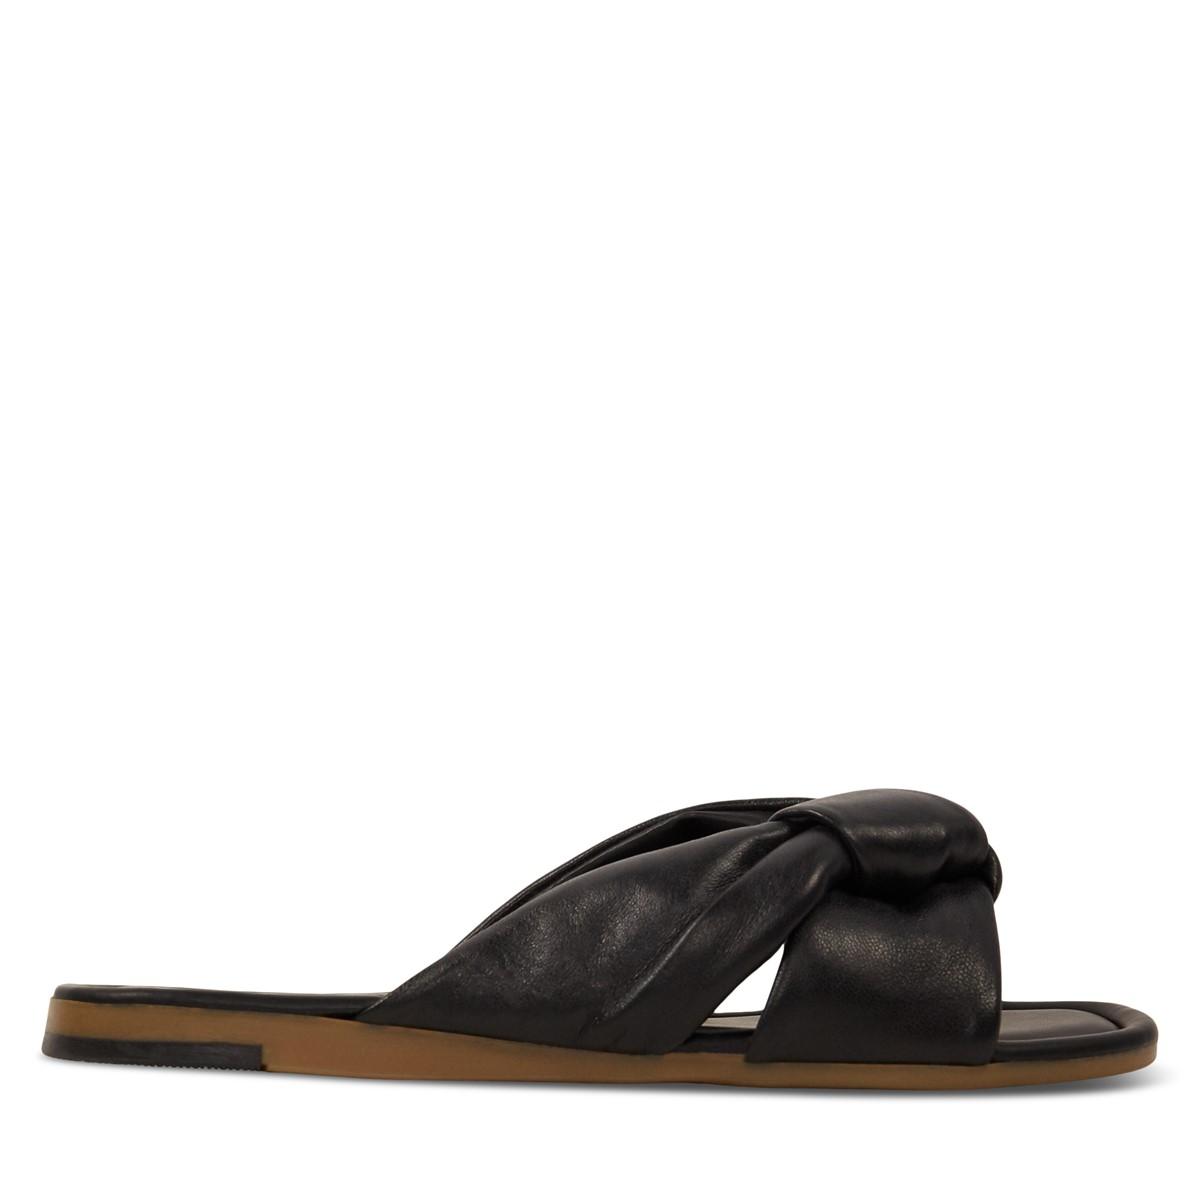 Women's Cora Slip-On Sandals in Black